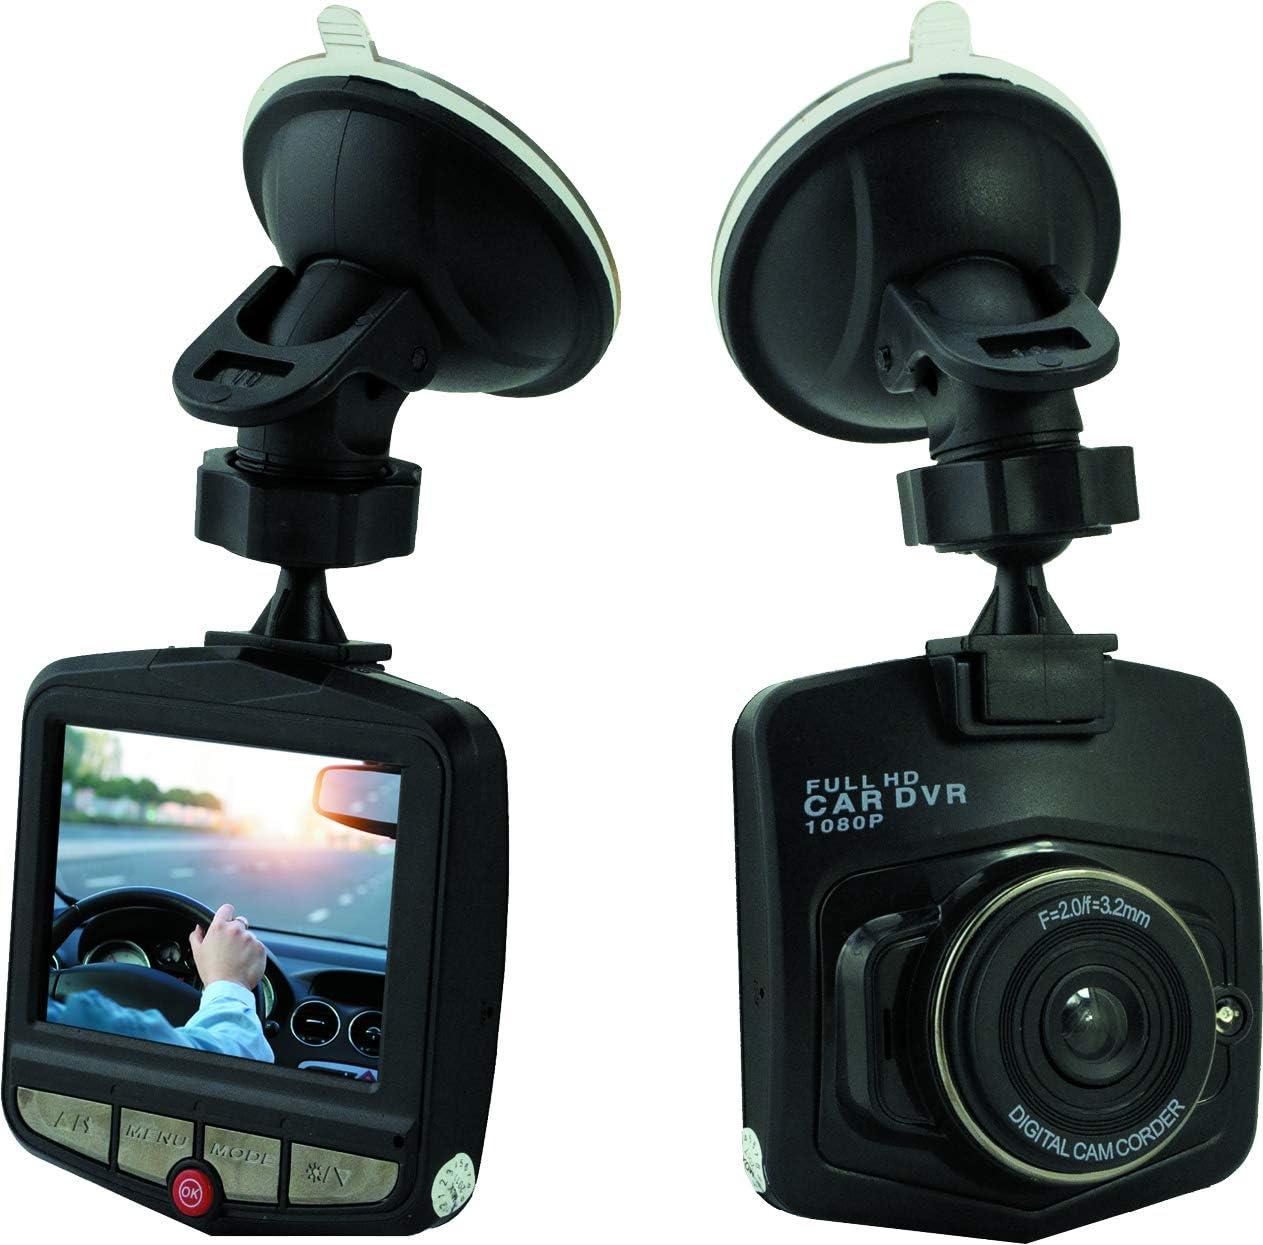 Denver Electronics Dv 20901 Cct 1210 Hd Dashcam Mit 2 4 Zoll Lcd Display Baumarkt